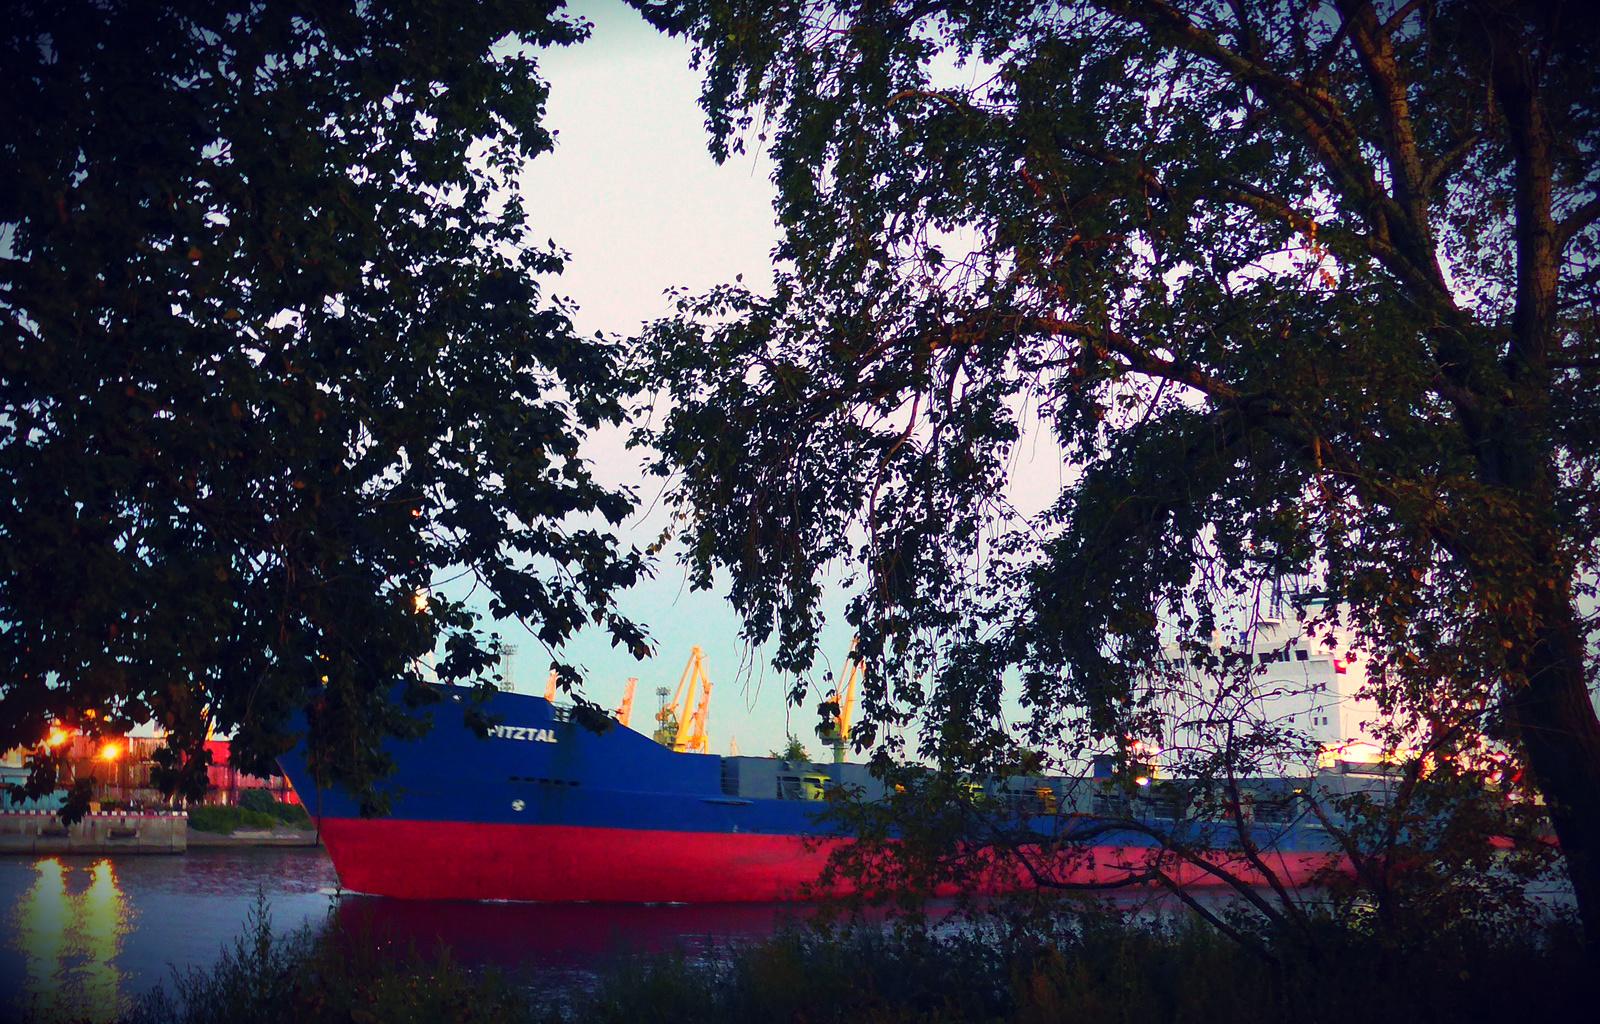 Kanonersky Island | St Petersburg, Russia (2015)